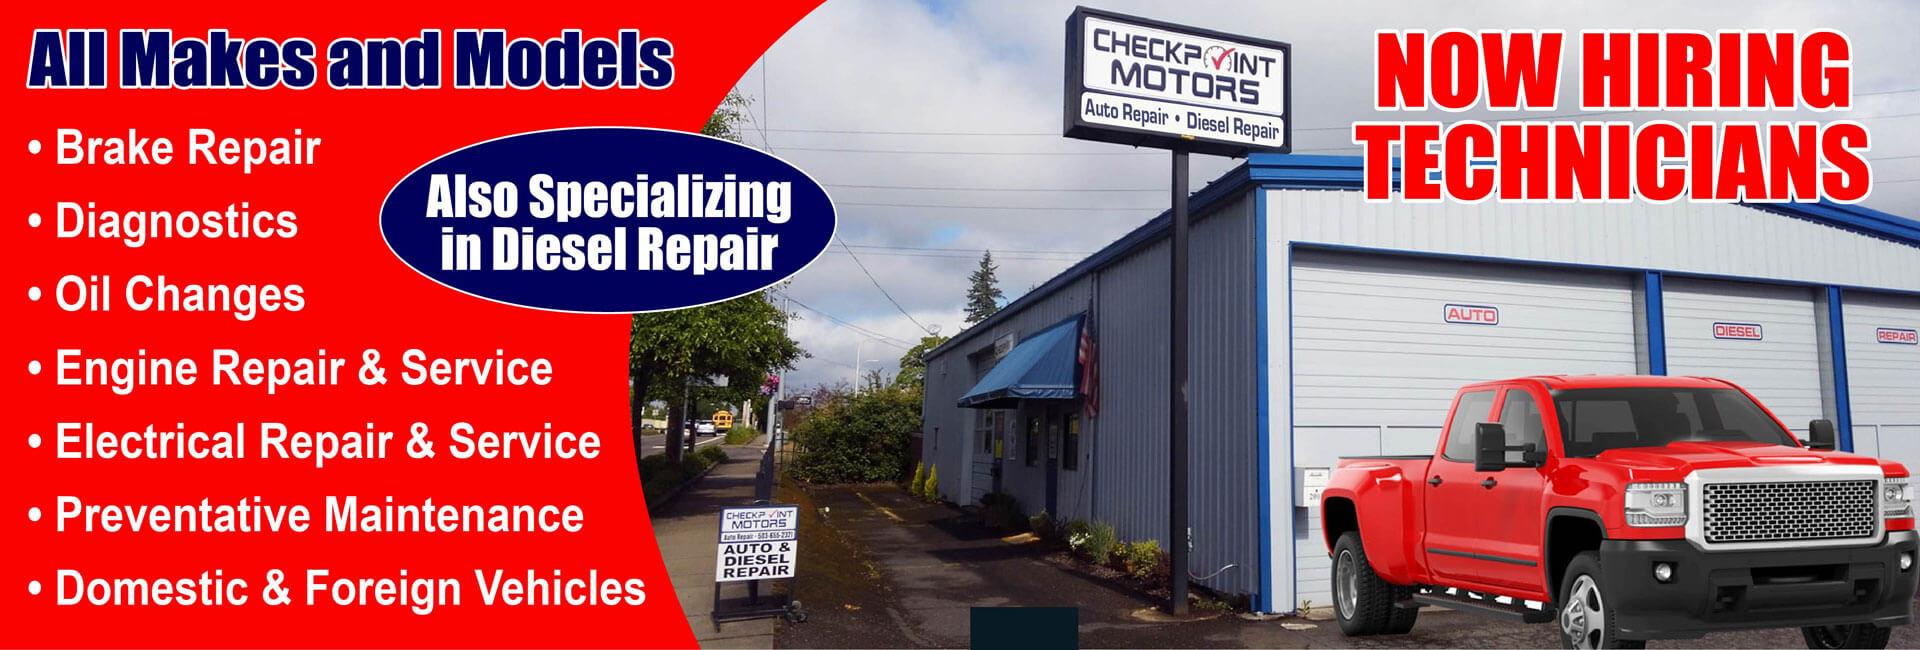 Brake Places Near Me >> Auto Repair Oregon City Or Brakes Transmission Repair Oil Changes